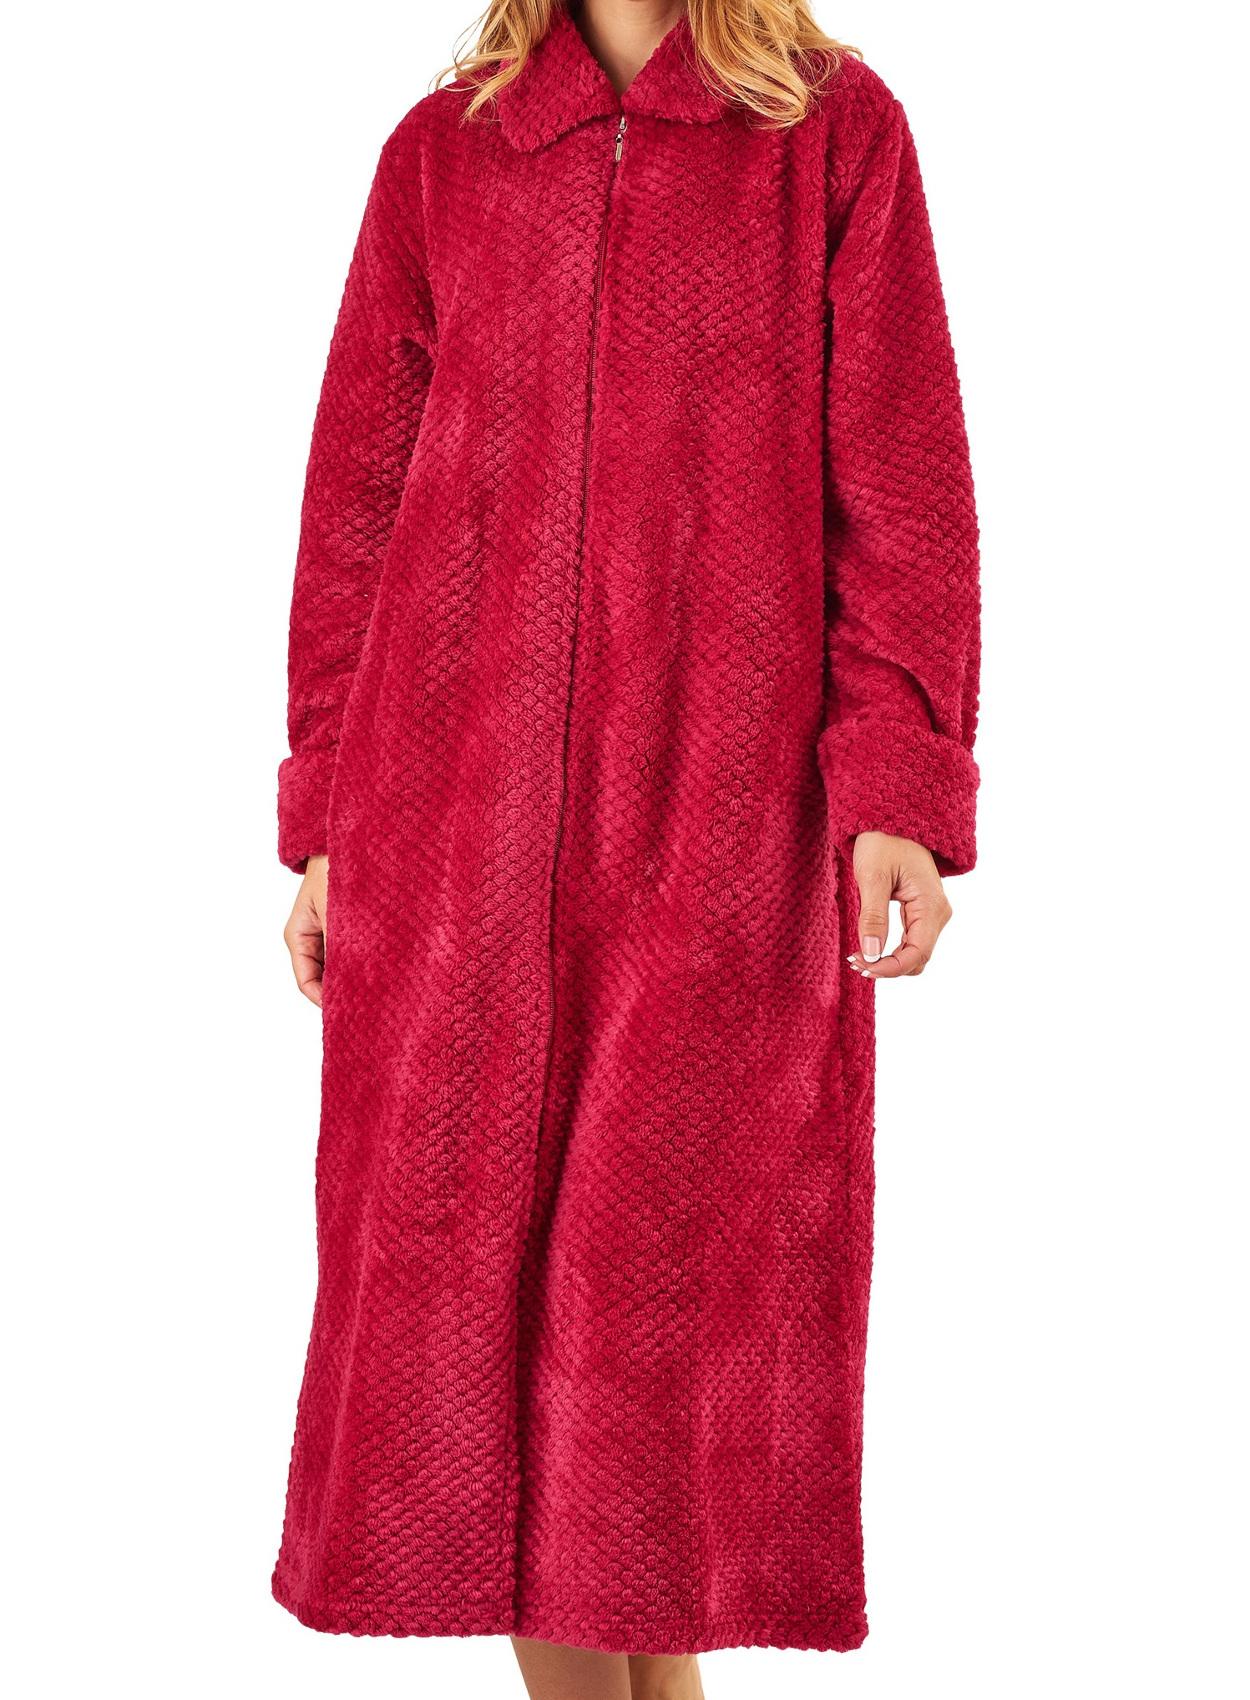 Dressing Gown Ladies Zip Up Soft Waffle Fleece Slenderella